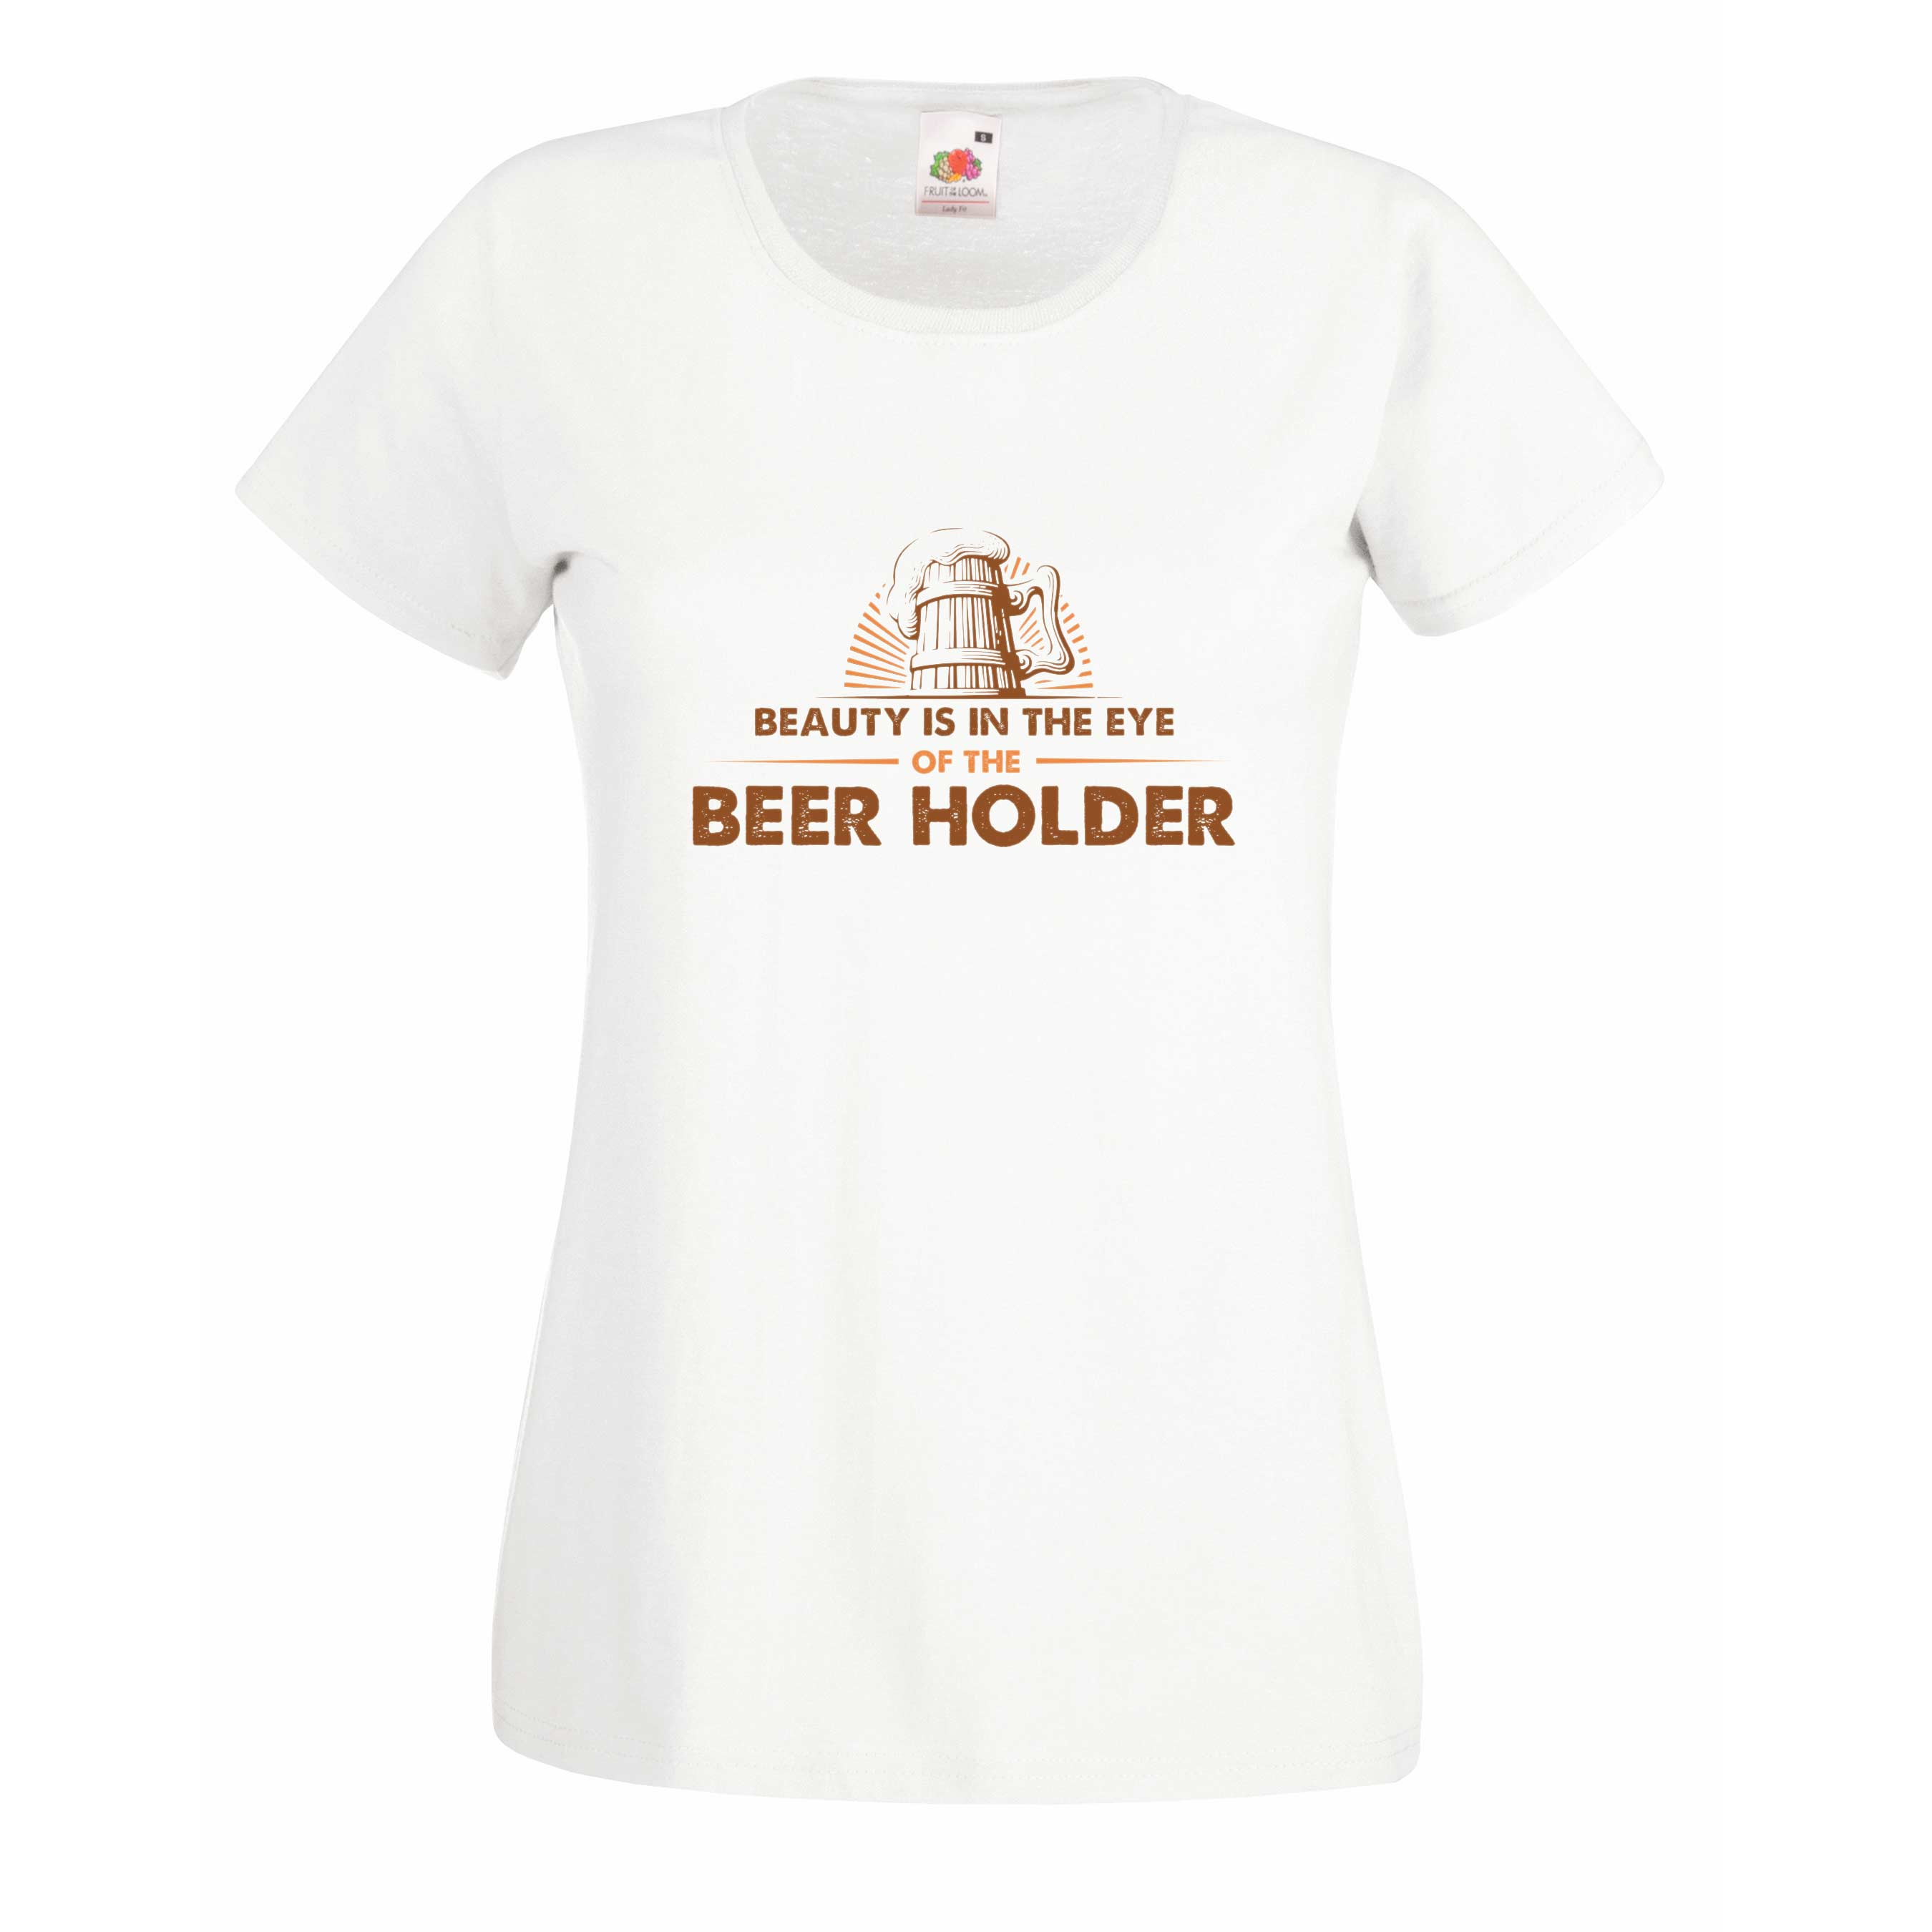 Beer Holder design for t-shirt, hoodie & sweatshirt